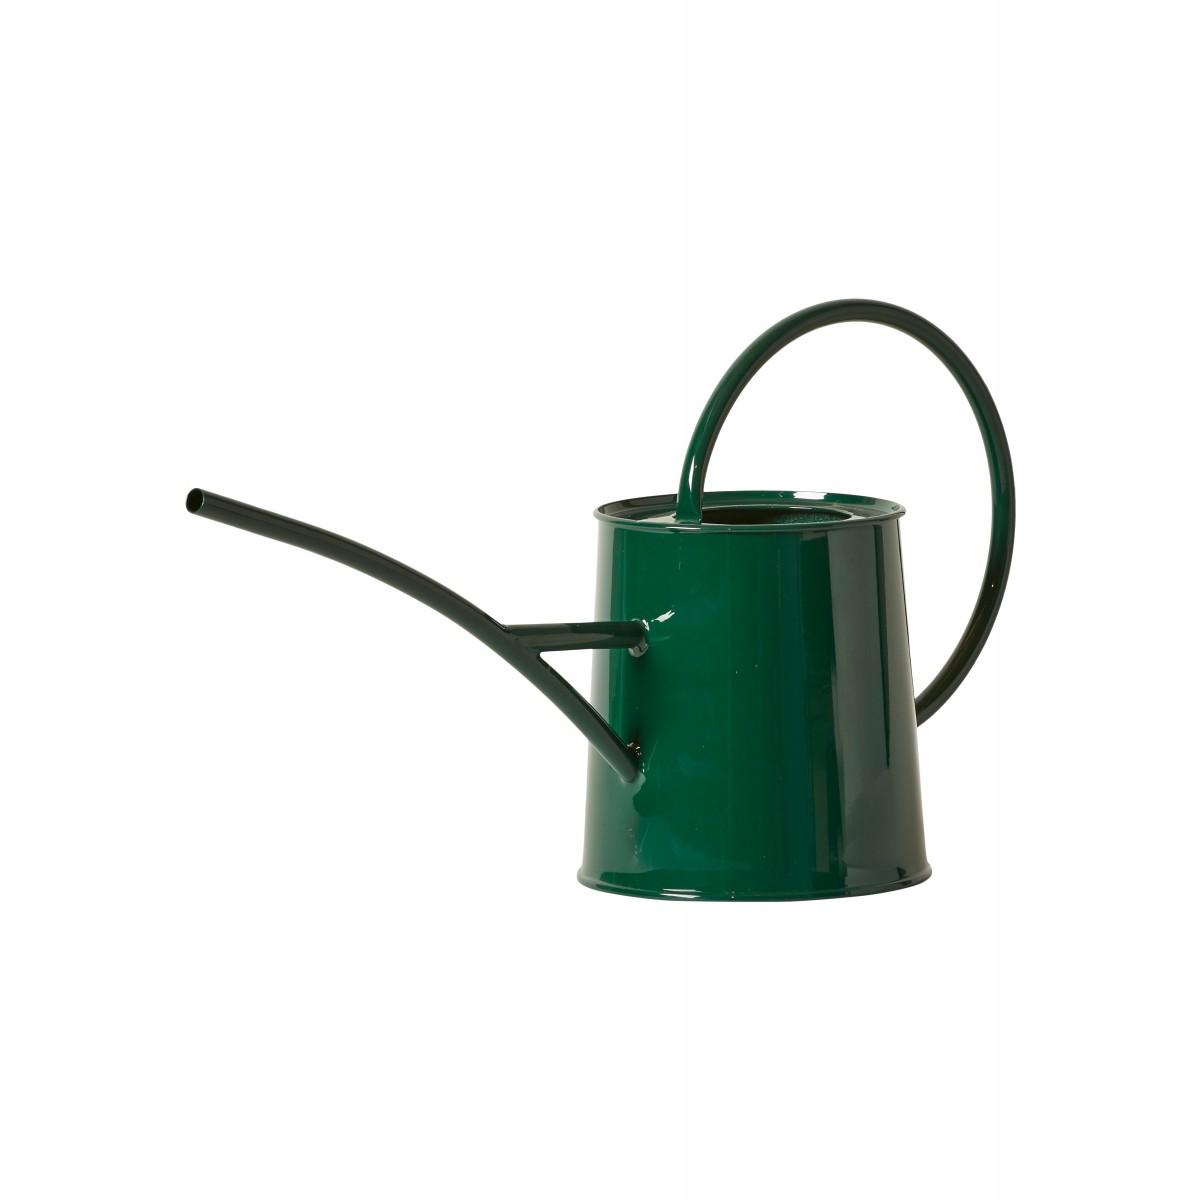 DACORE Vandkande 1,5 ltr grøn